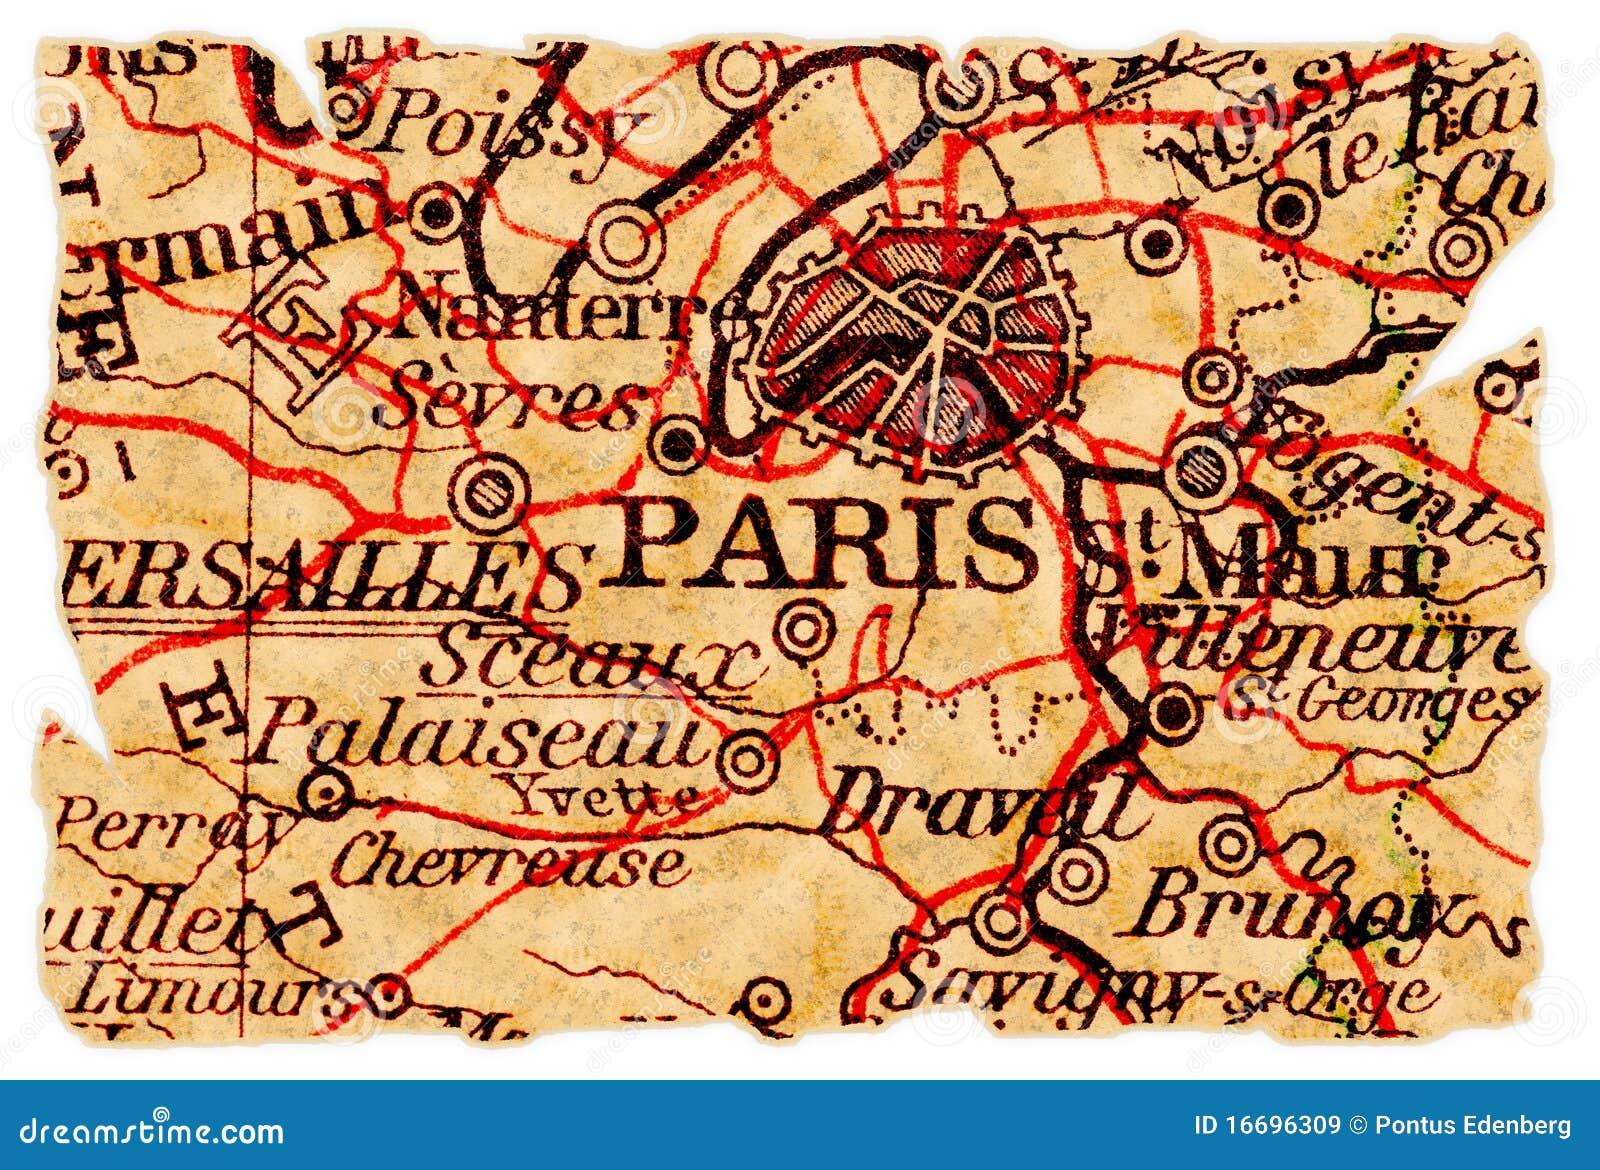 Old paris street map royalty free stock photo image 15885665 - Paris Old Map Royalty Free Stock Images